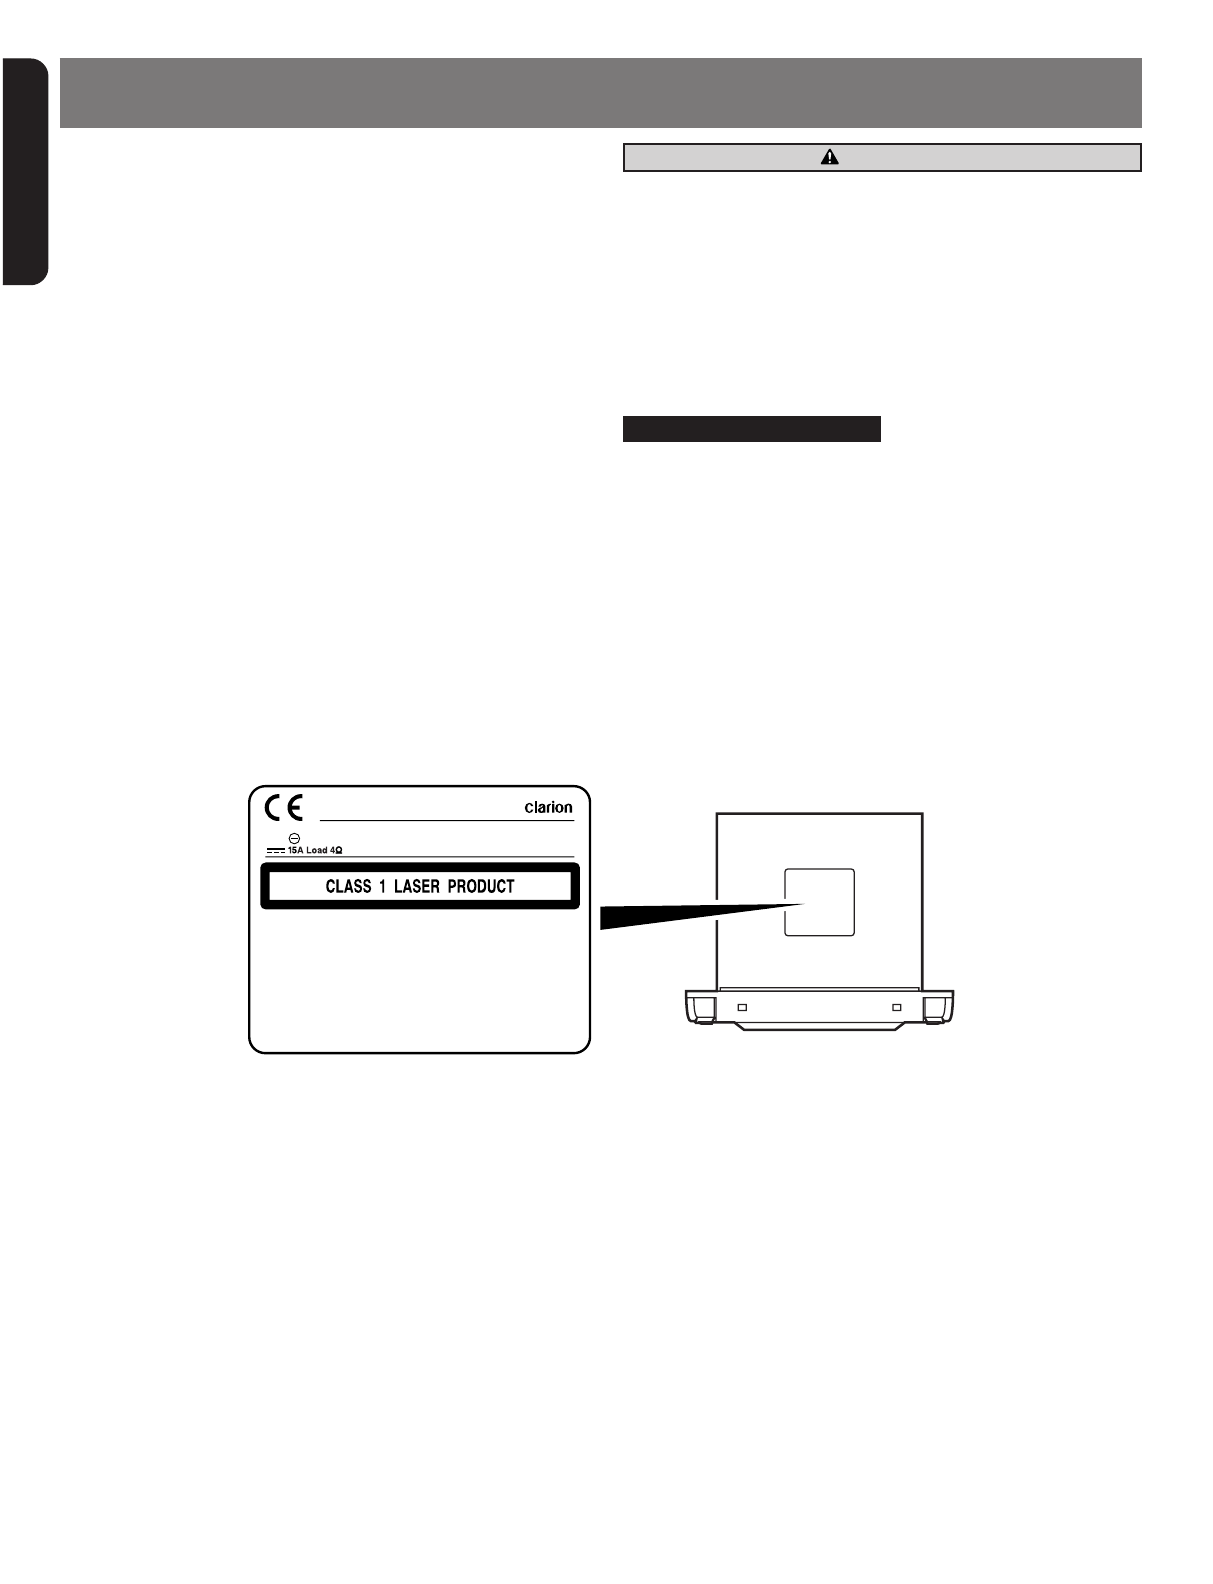 Handleiding Clarion Xmd3 Pagina 1 Van 22 English Wiring Diagram 3